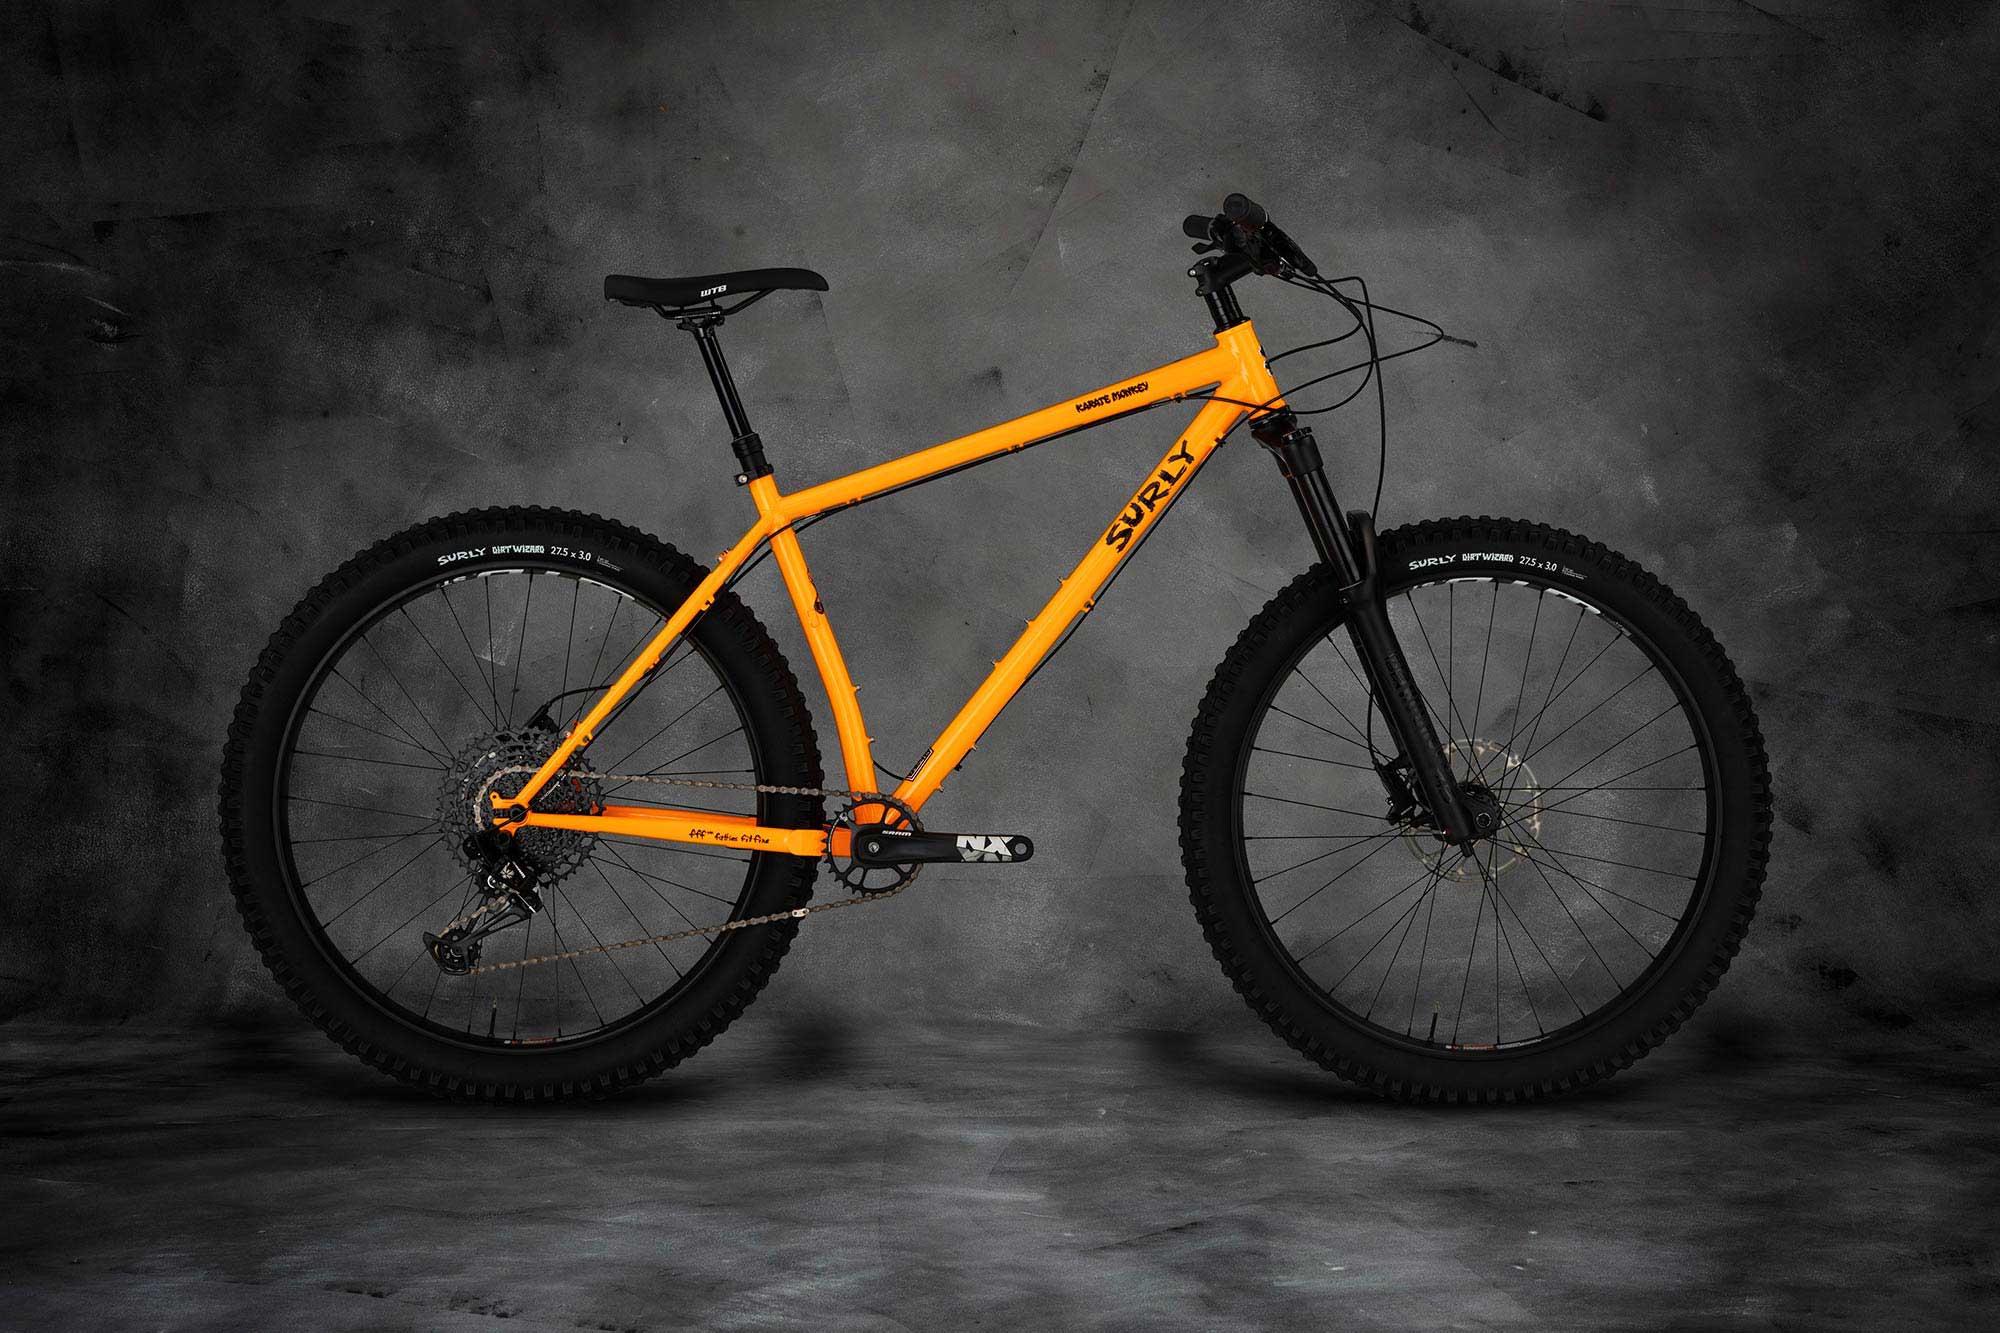 Surly Karate Monkey Bike - Toxic Tangerine - right side view